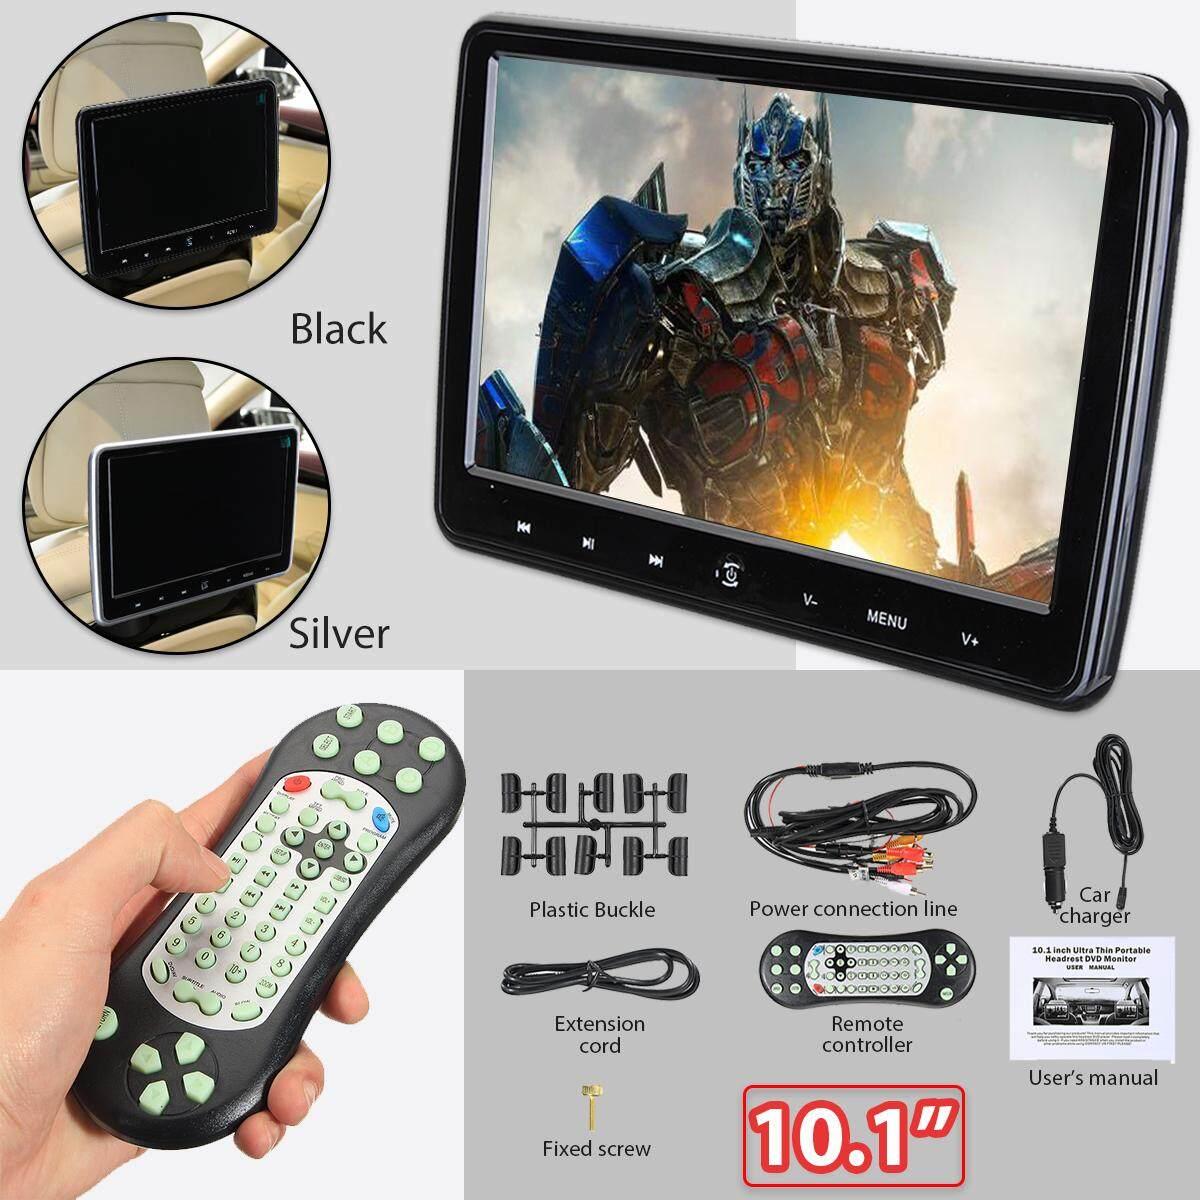 10.1 Car Hd Lcd Touch Screen Headrest Pillow Monitor Sd/dvd/usb Player Ir/fm Nj Wireless Games Touch Key Hdmi - Intl By Audew.